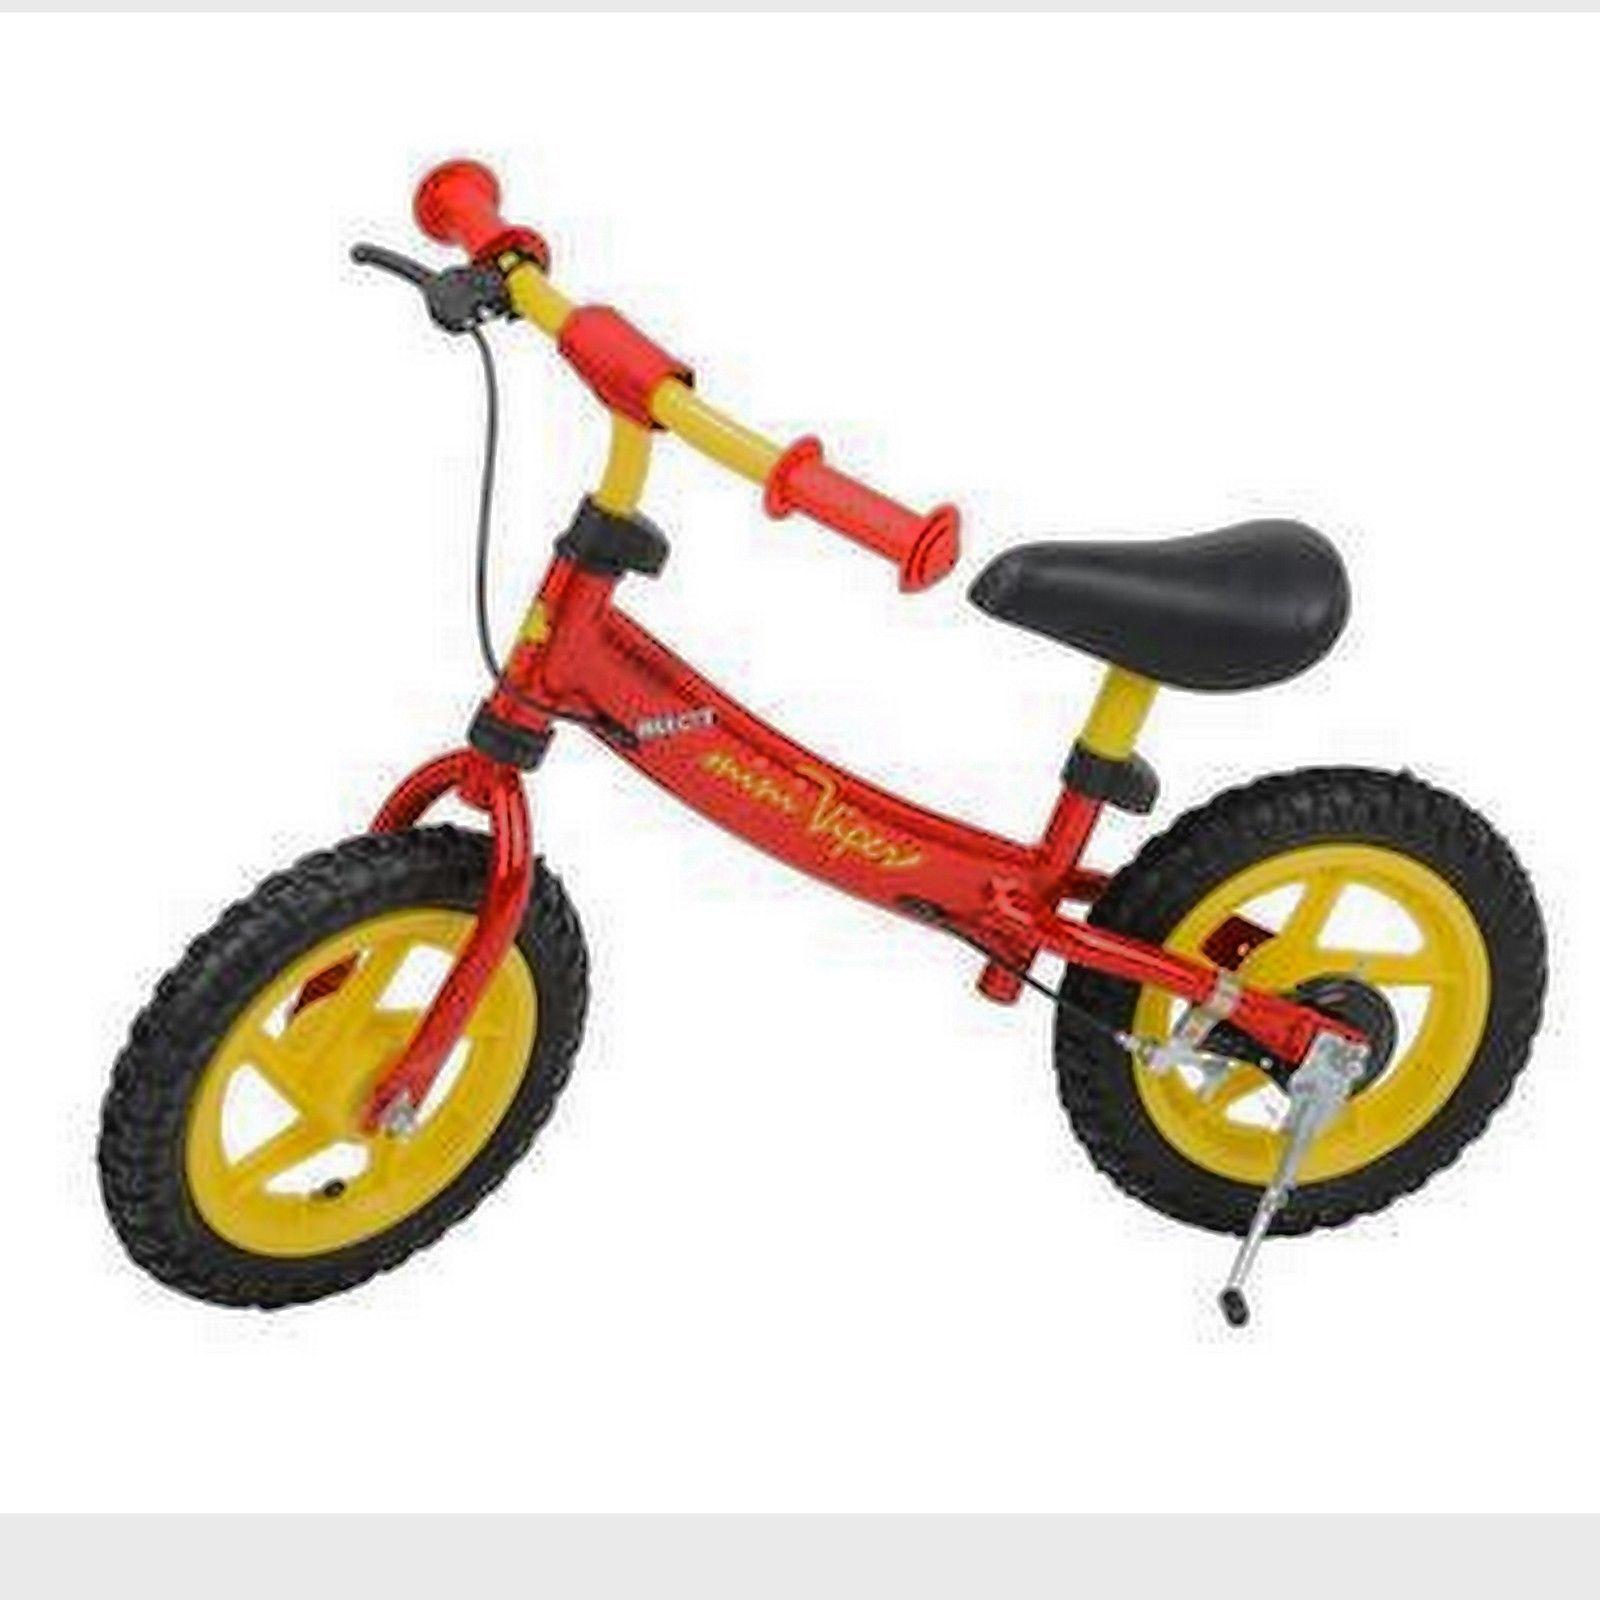 Laufrad Fahrrad Monz Roller Modellen Scooter